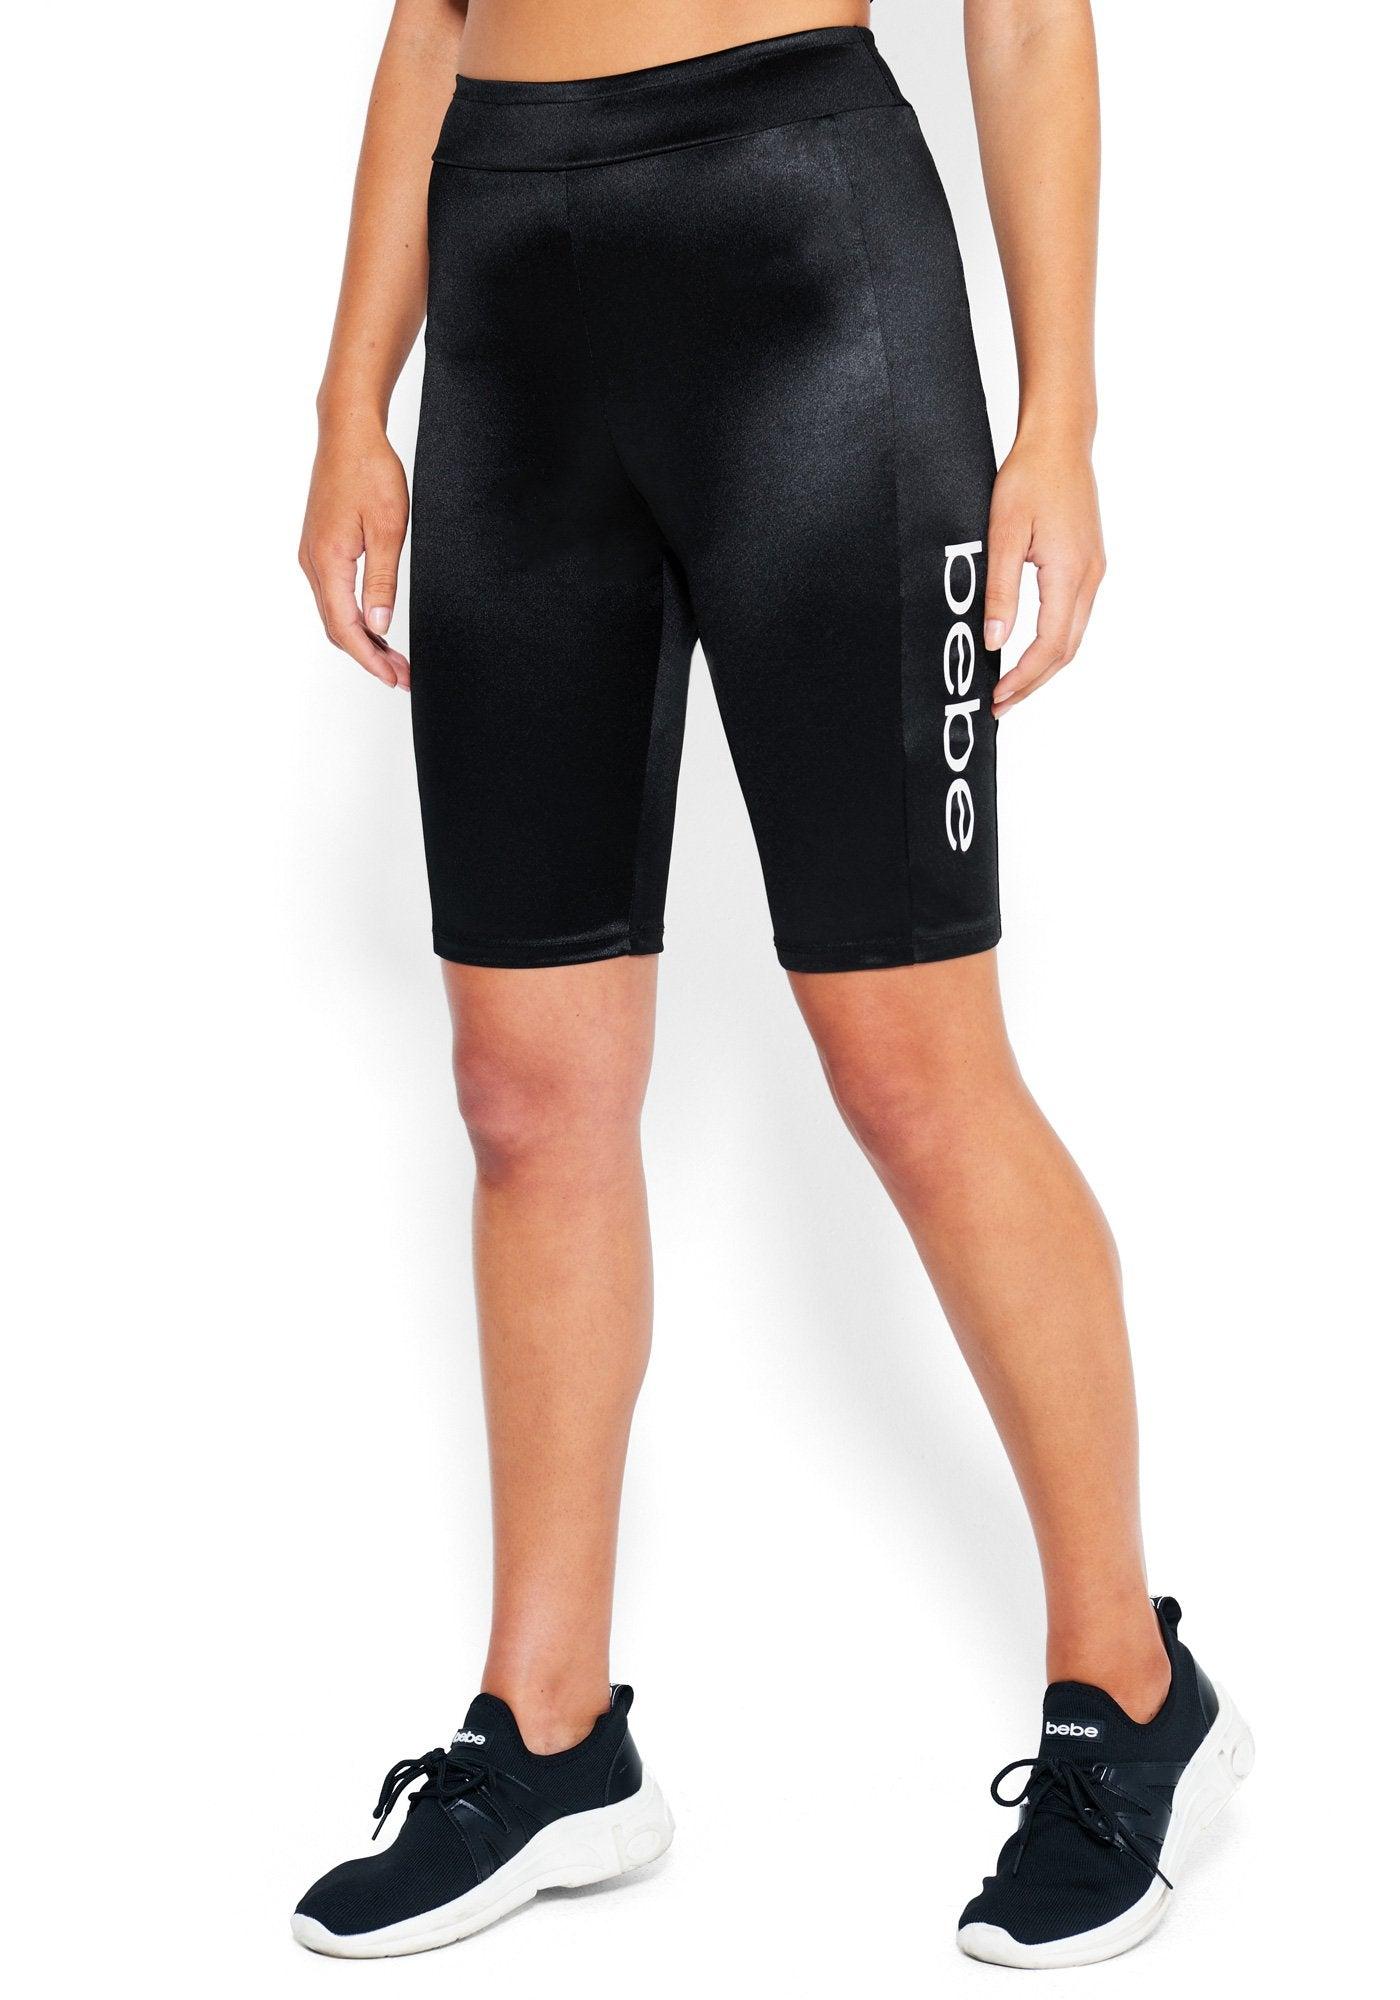 bebe Women's Mya Bebe Logo Bike Shorts, Size Large in Black Spandex